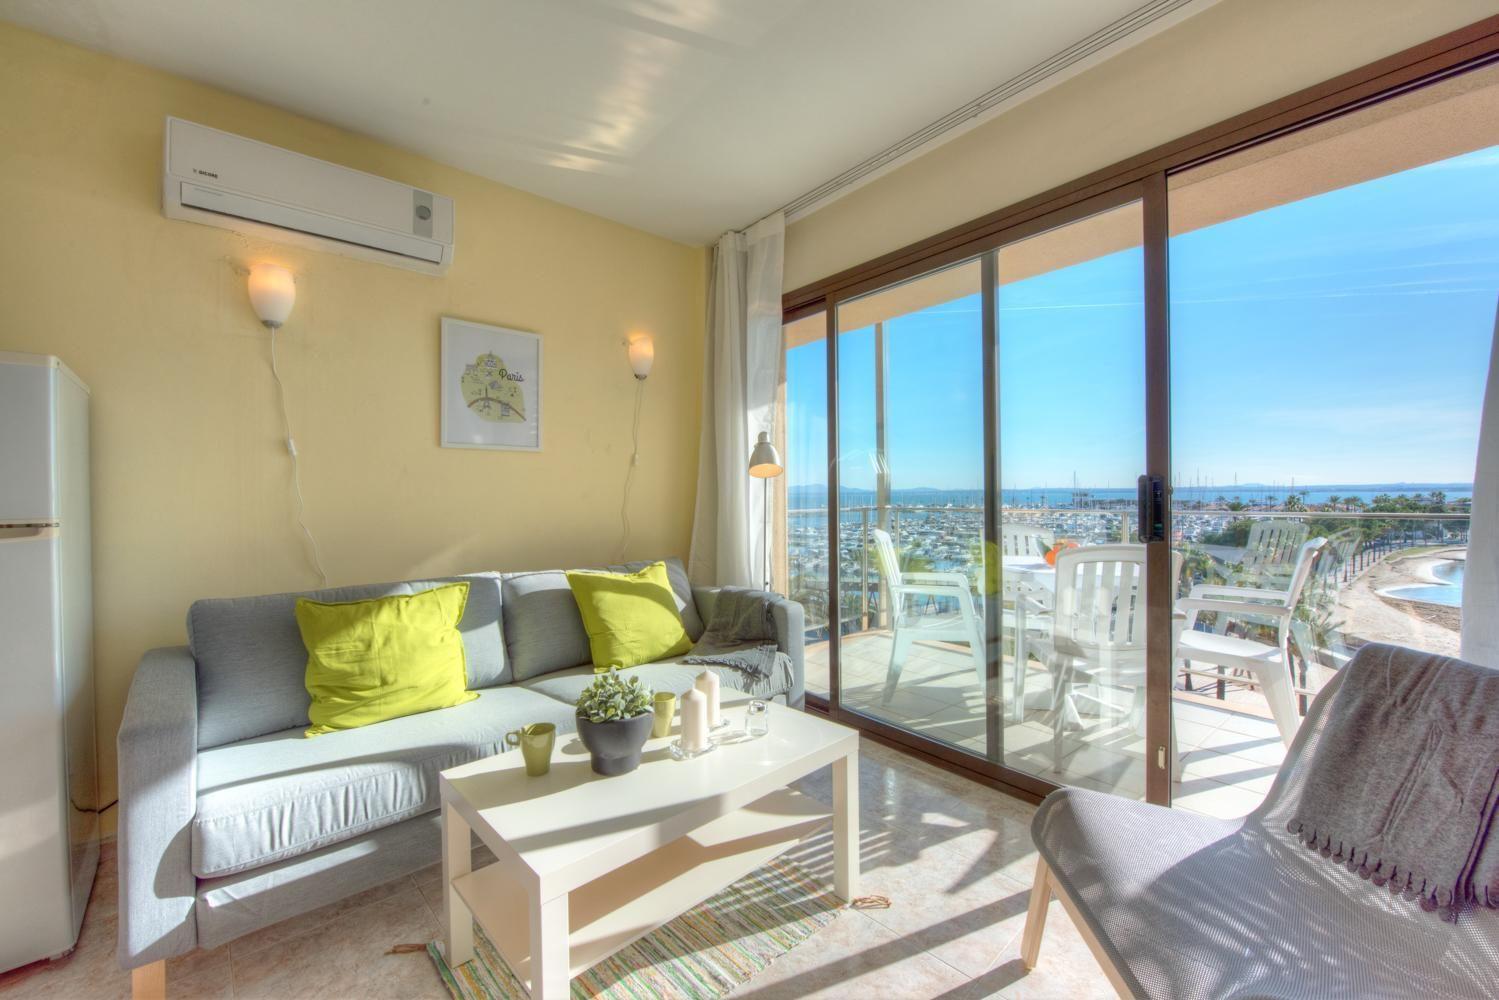 Sunnybeach Apartment